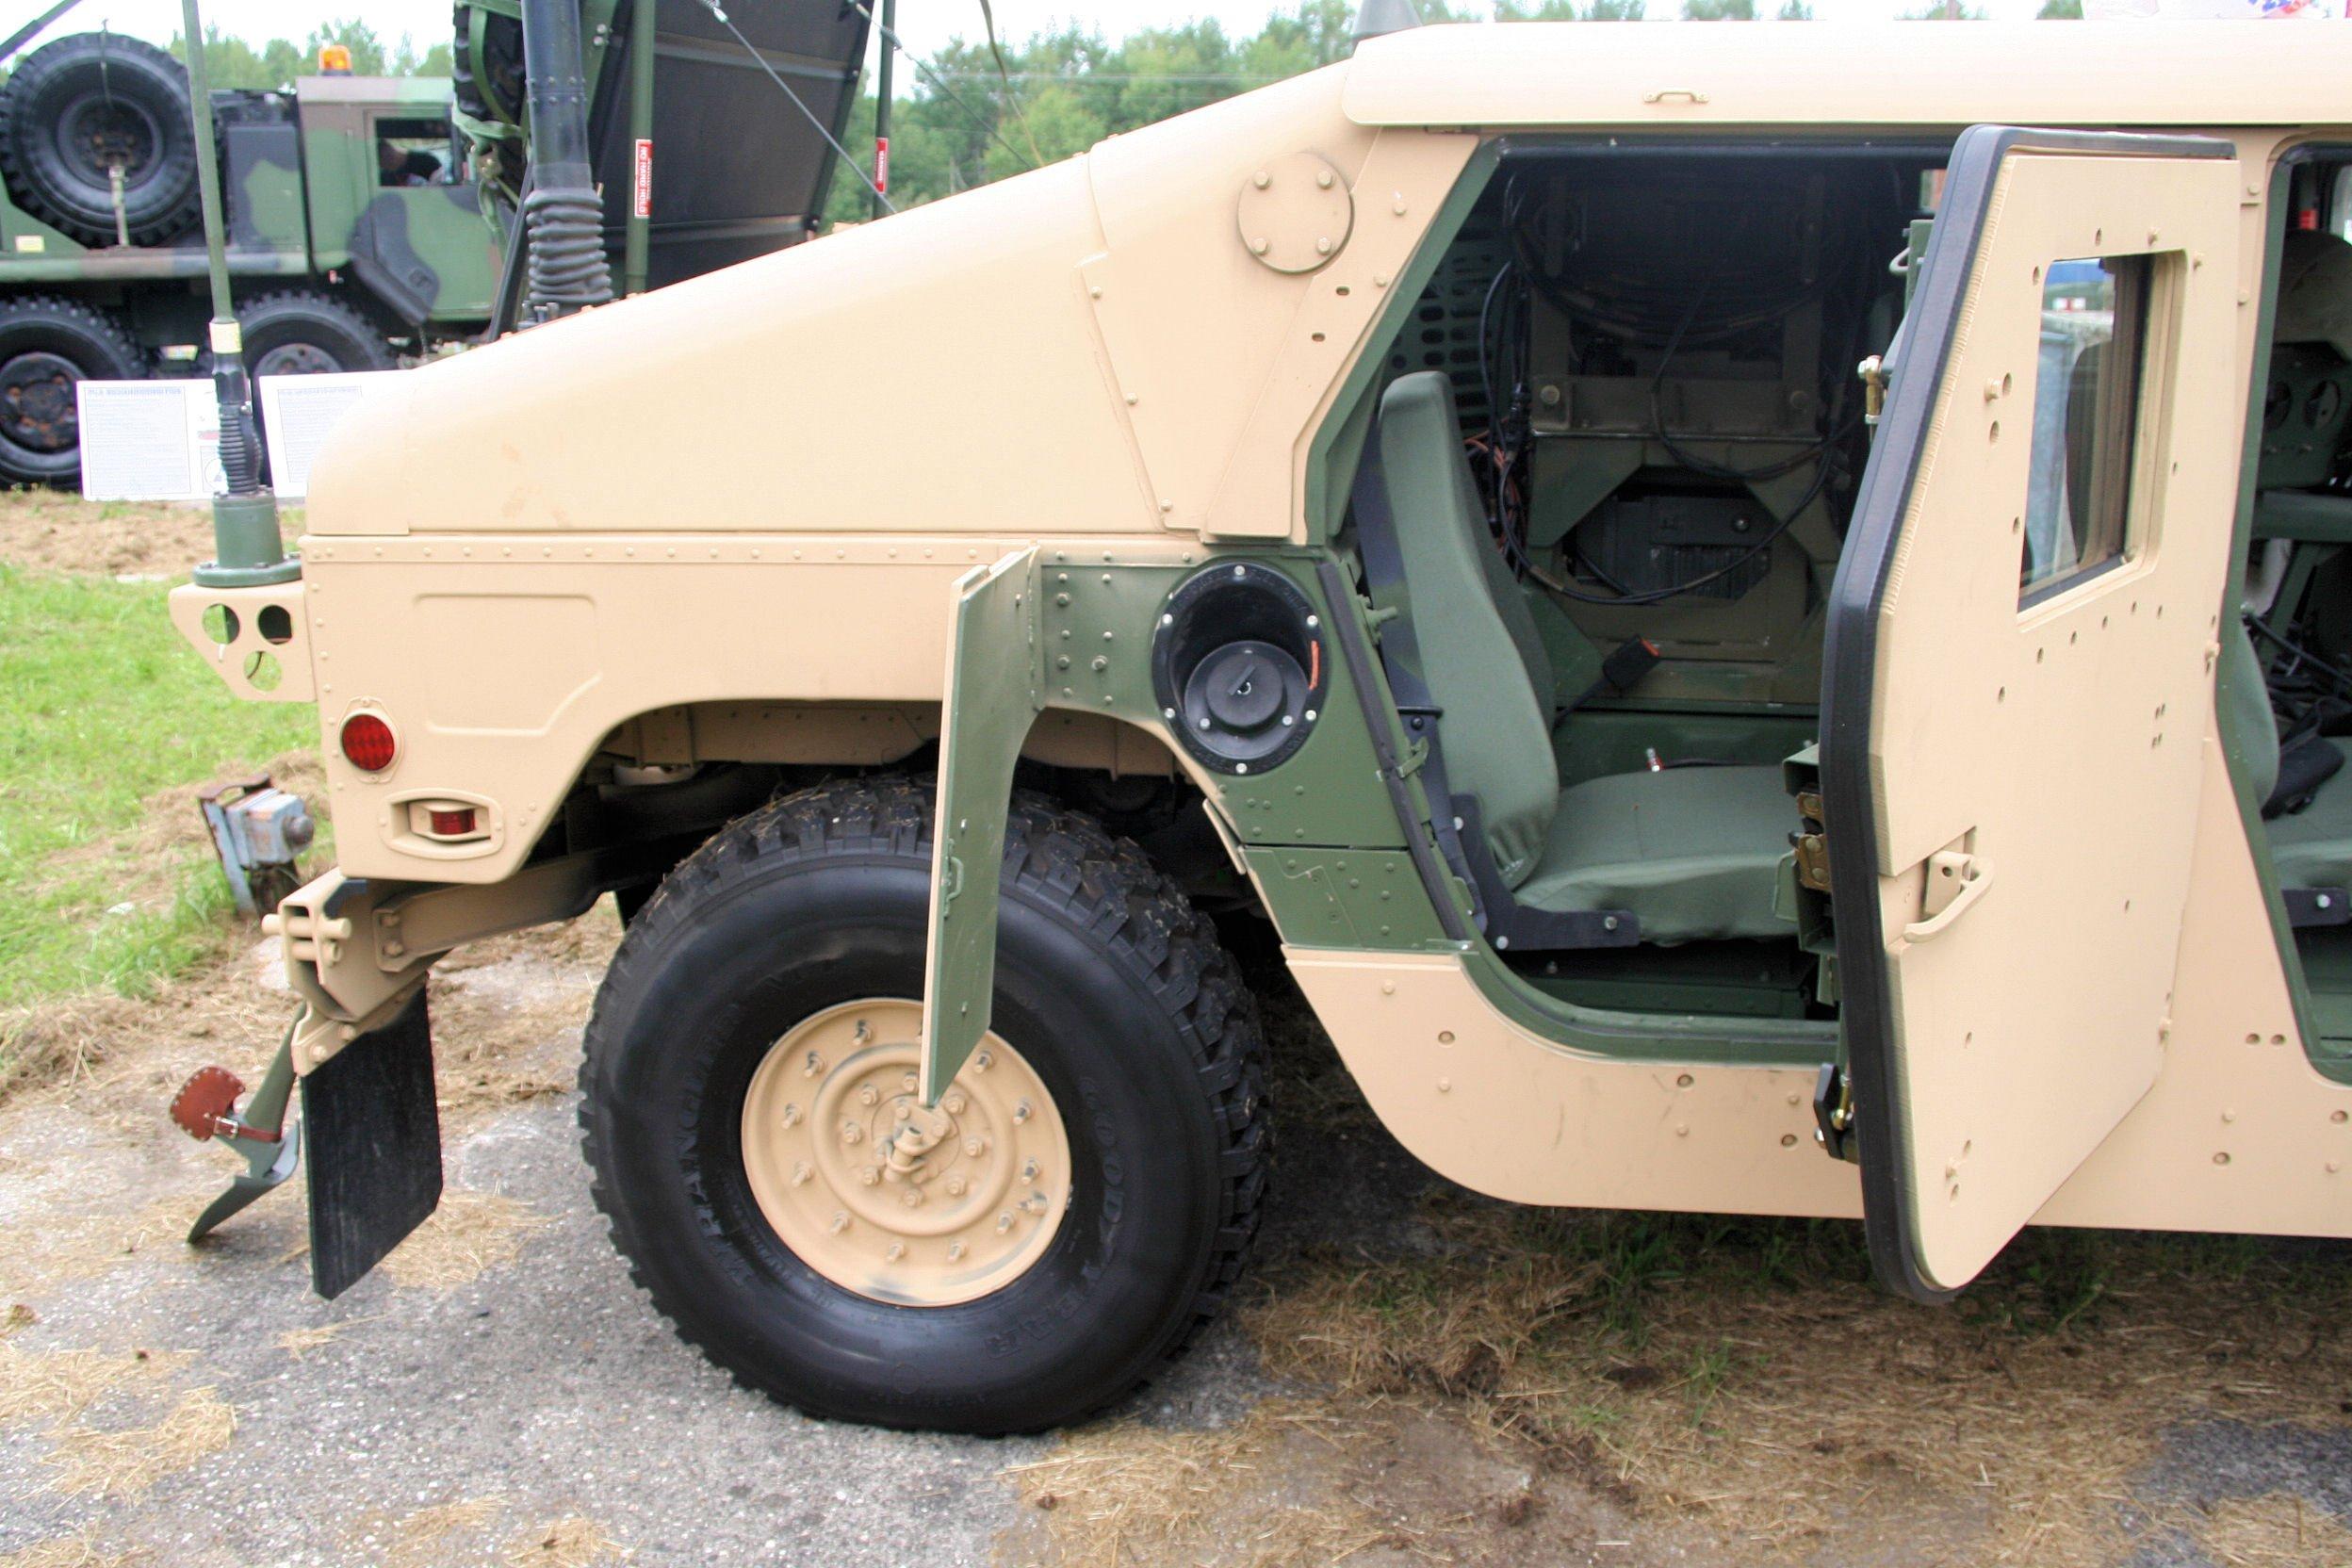 & Armorama :: Tamiya Humvee with Legend and Blast AM pezcame.com